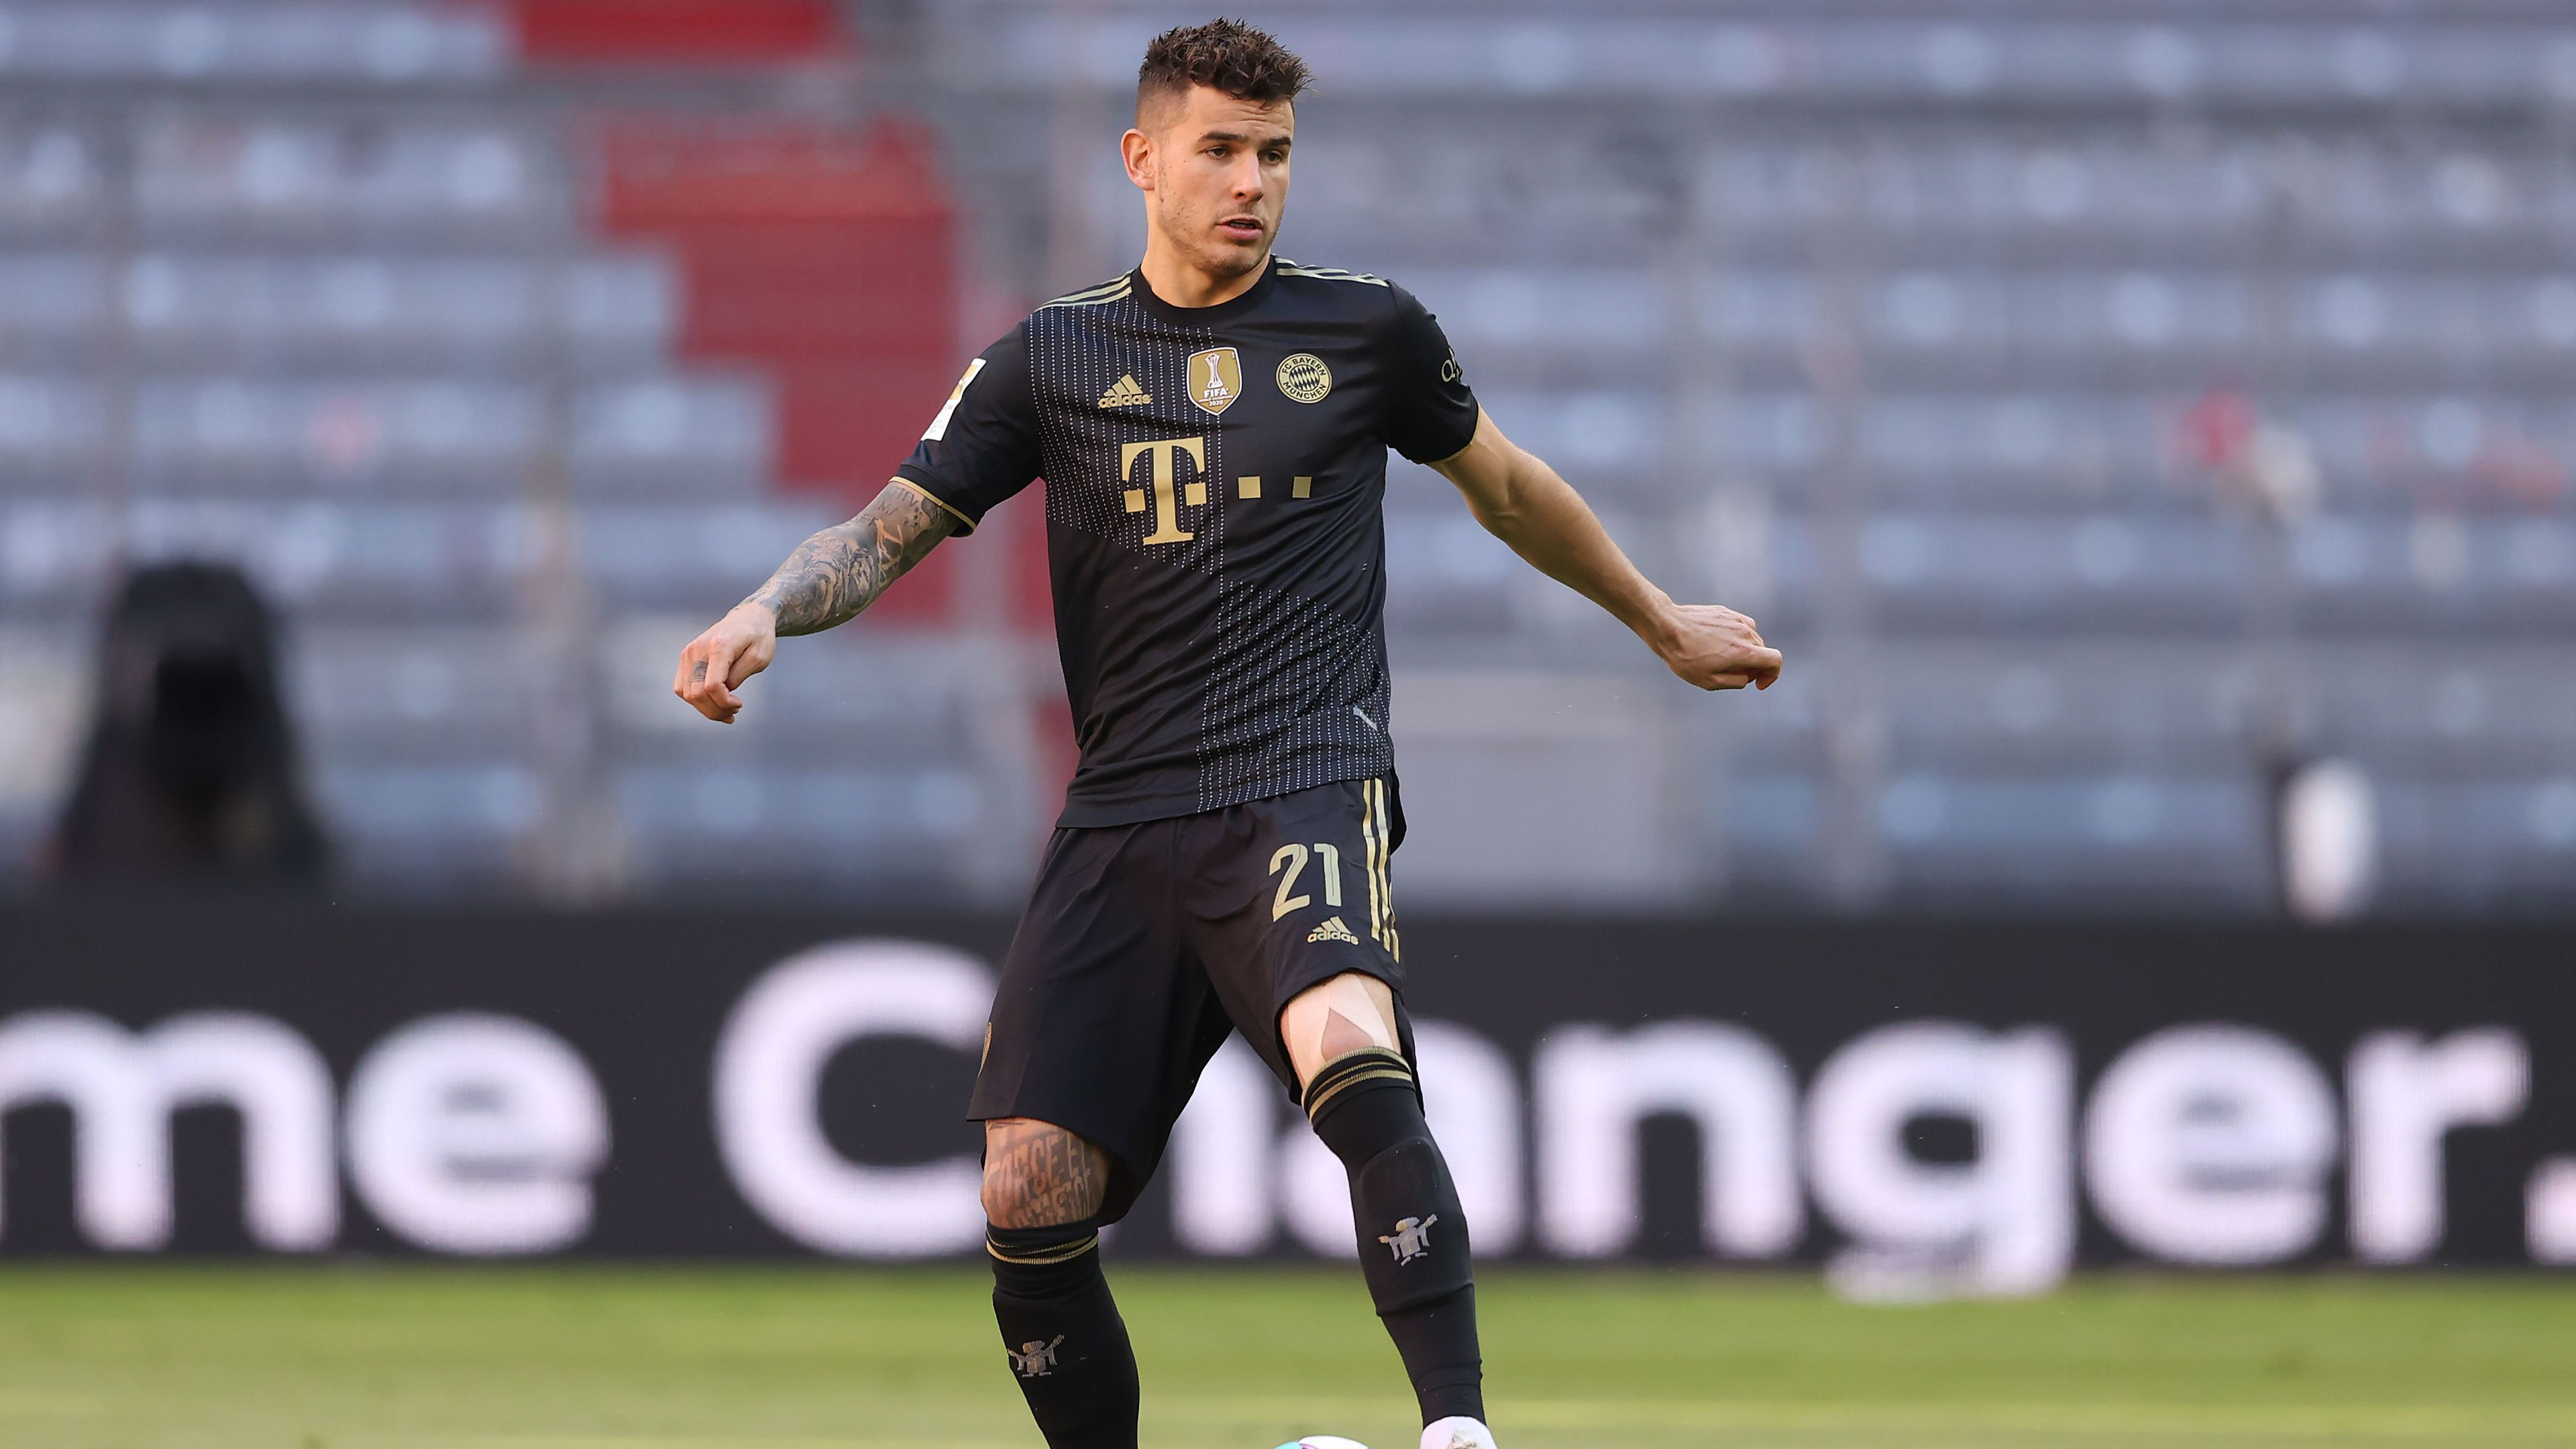 Football star given deadline to enter prison